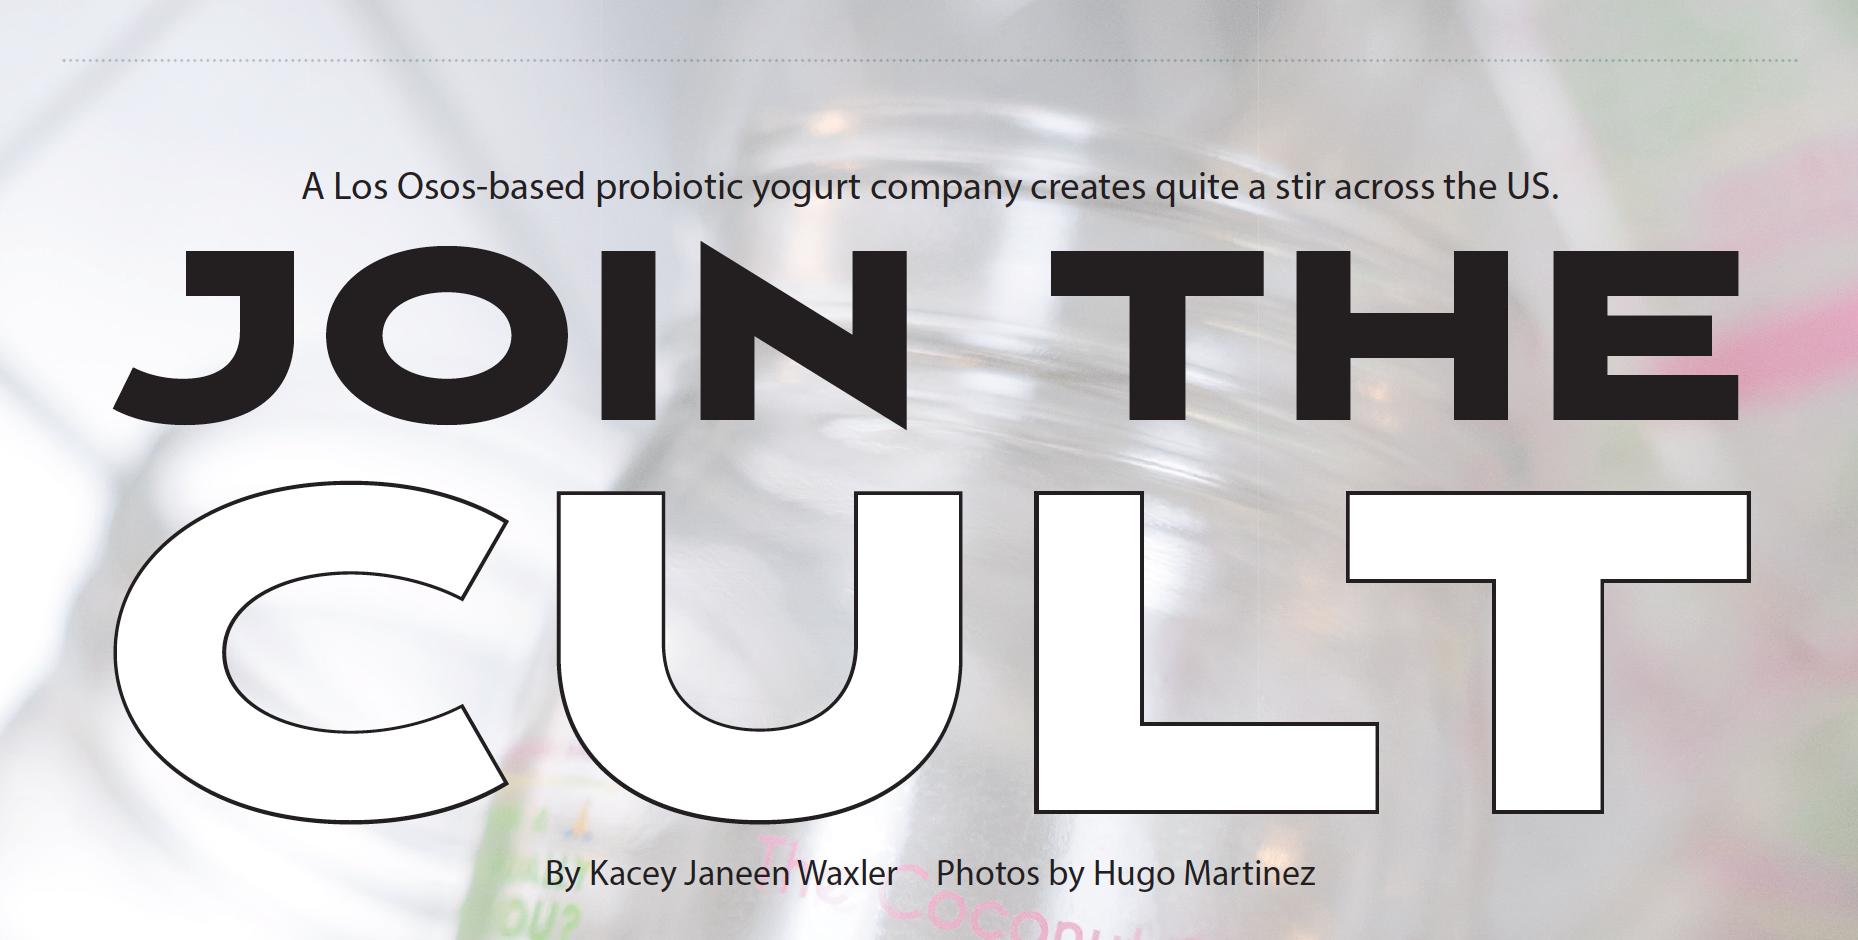 coconut cult probiotic yogurt